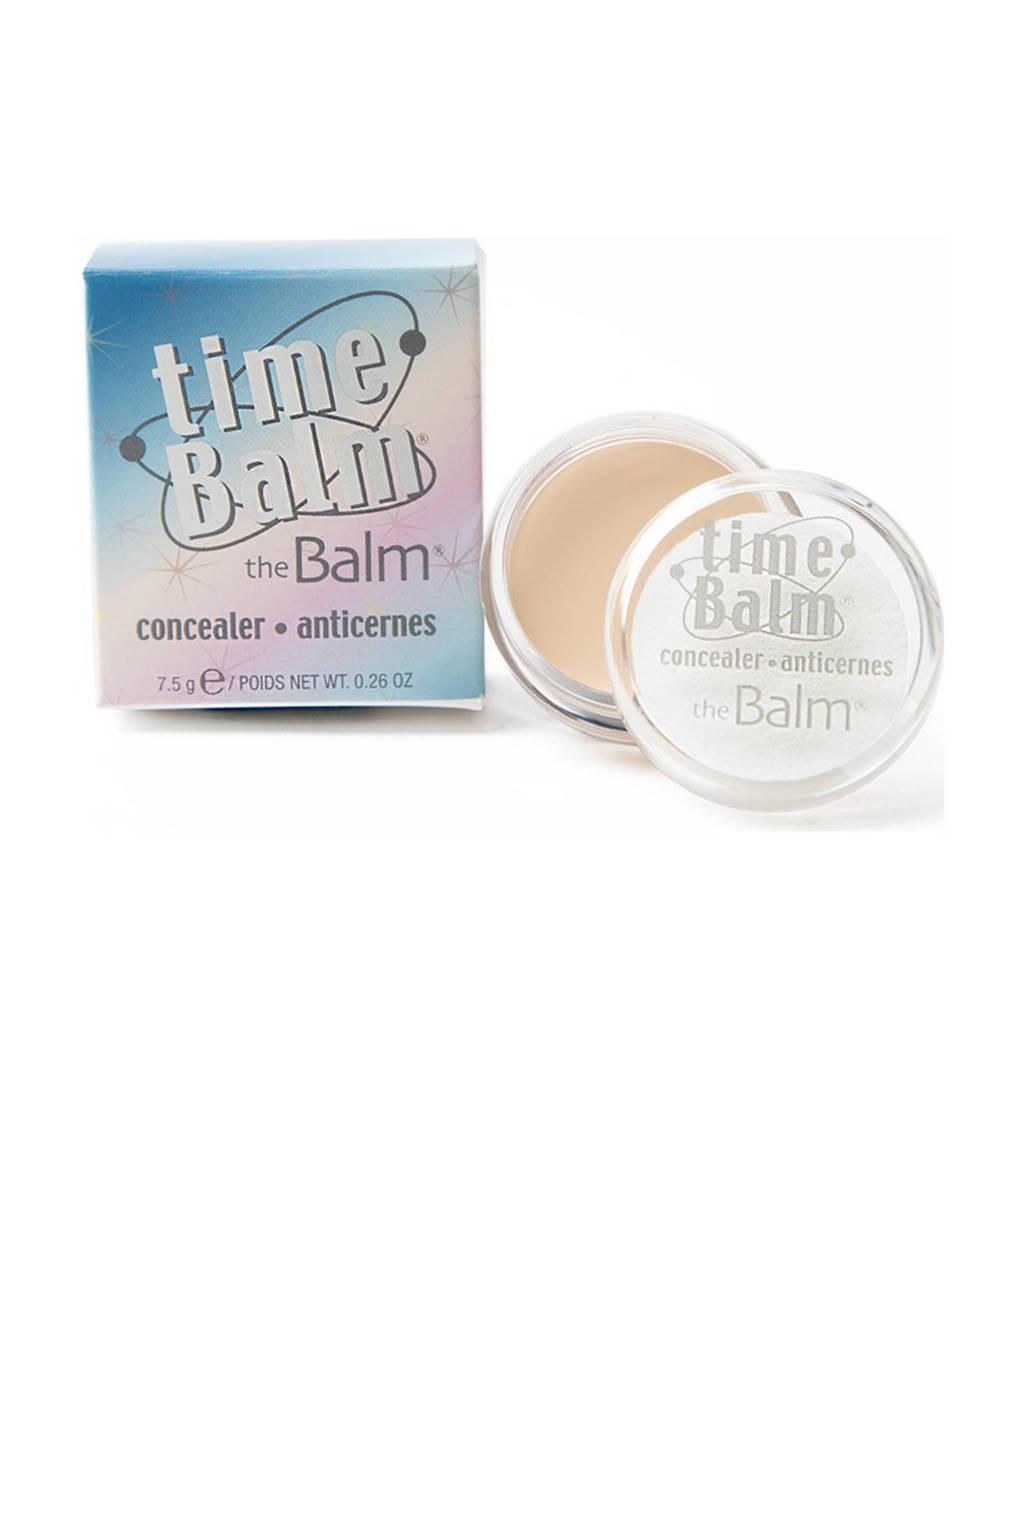 The Balm timeBalm concealer - Lighter than Light, lighter than light